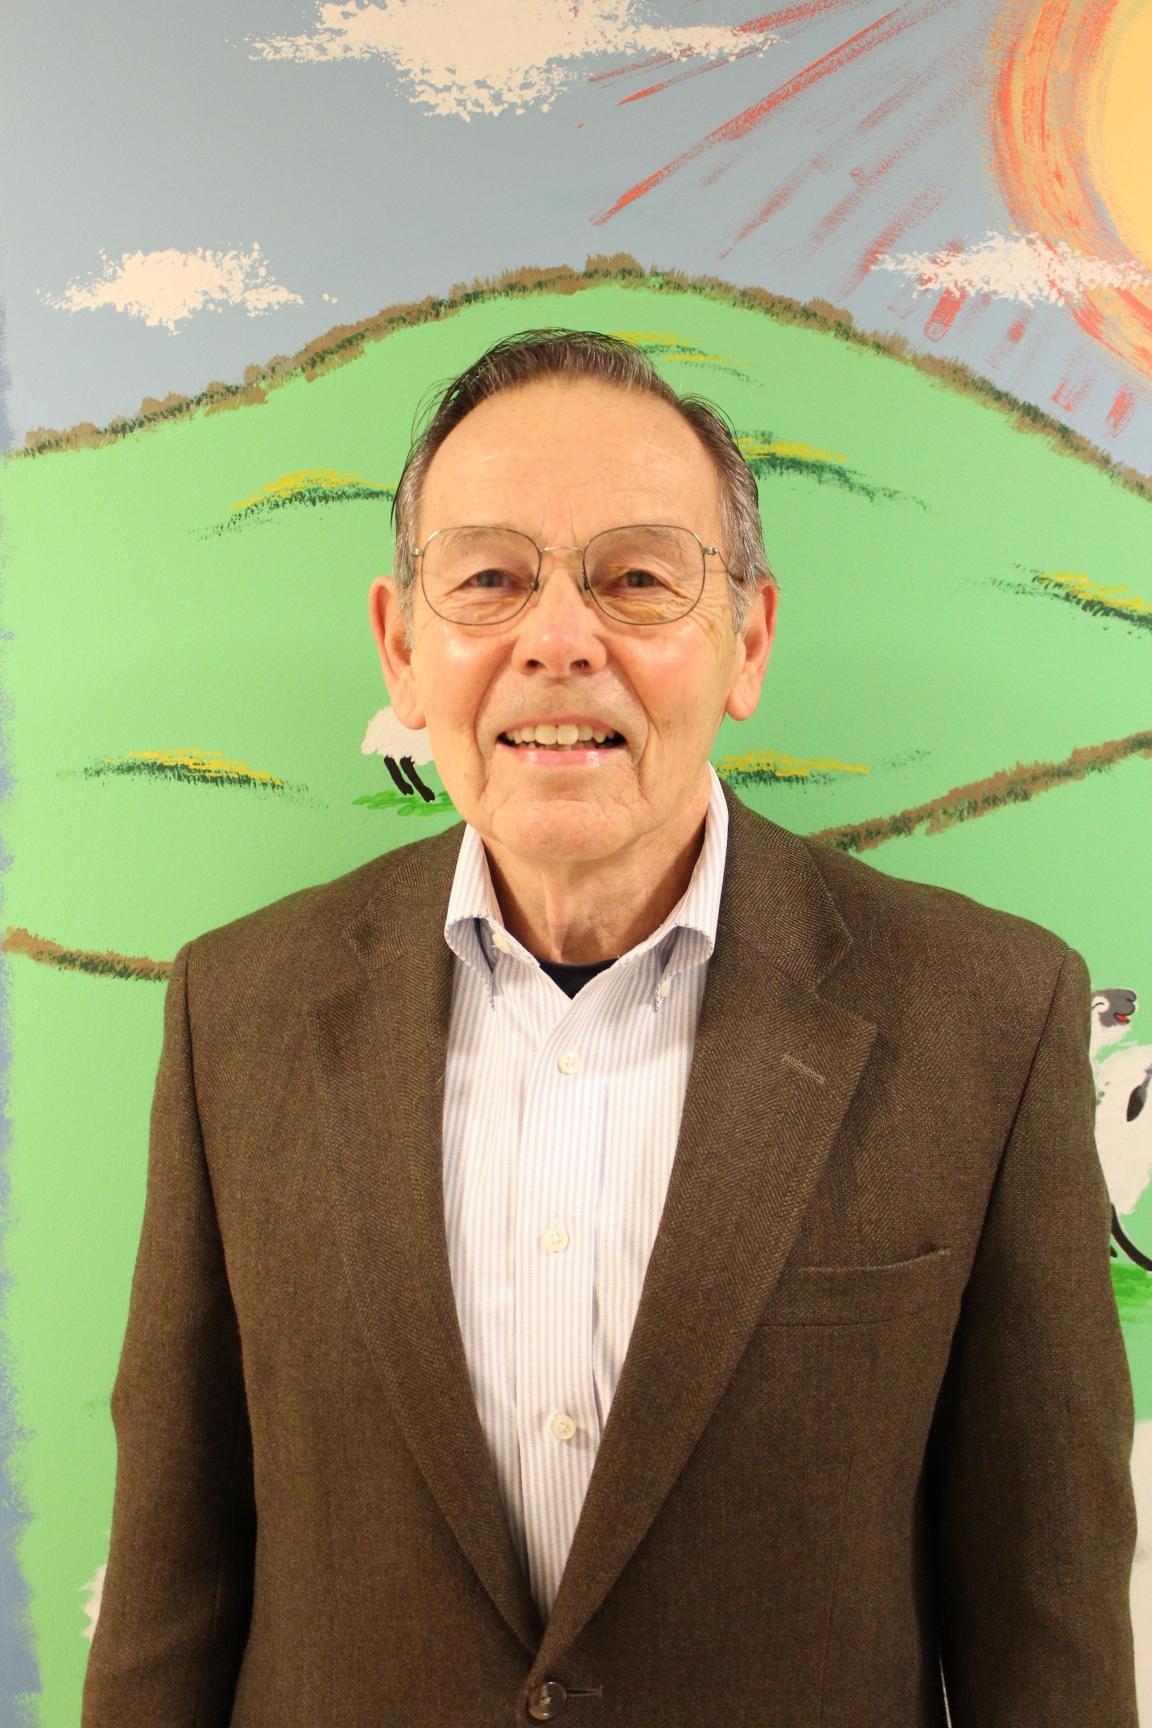 Mike Lafond